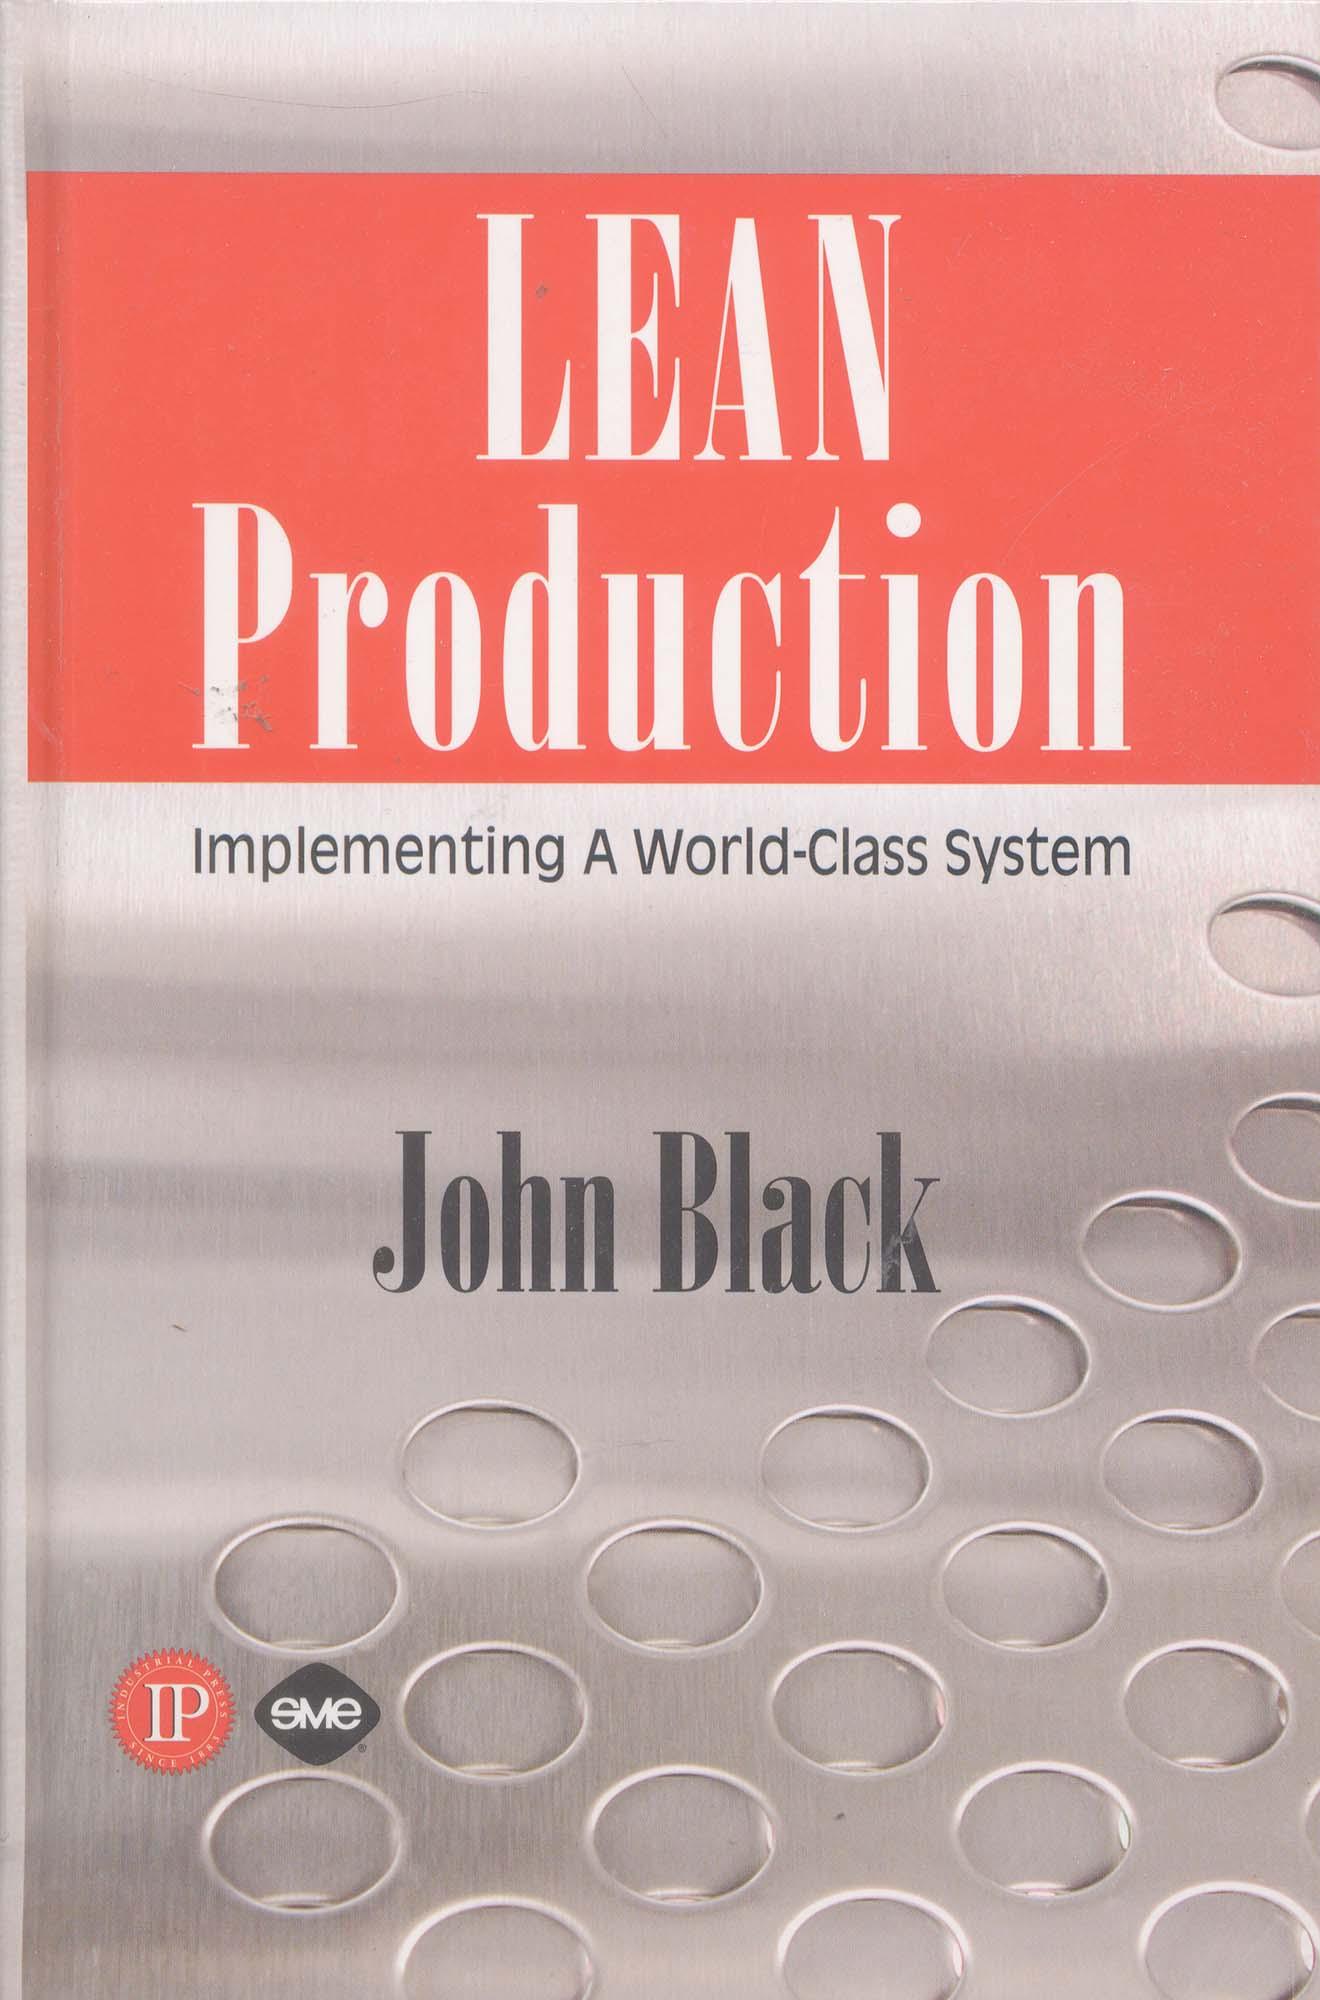 Book-Lean Production